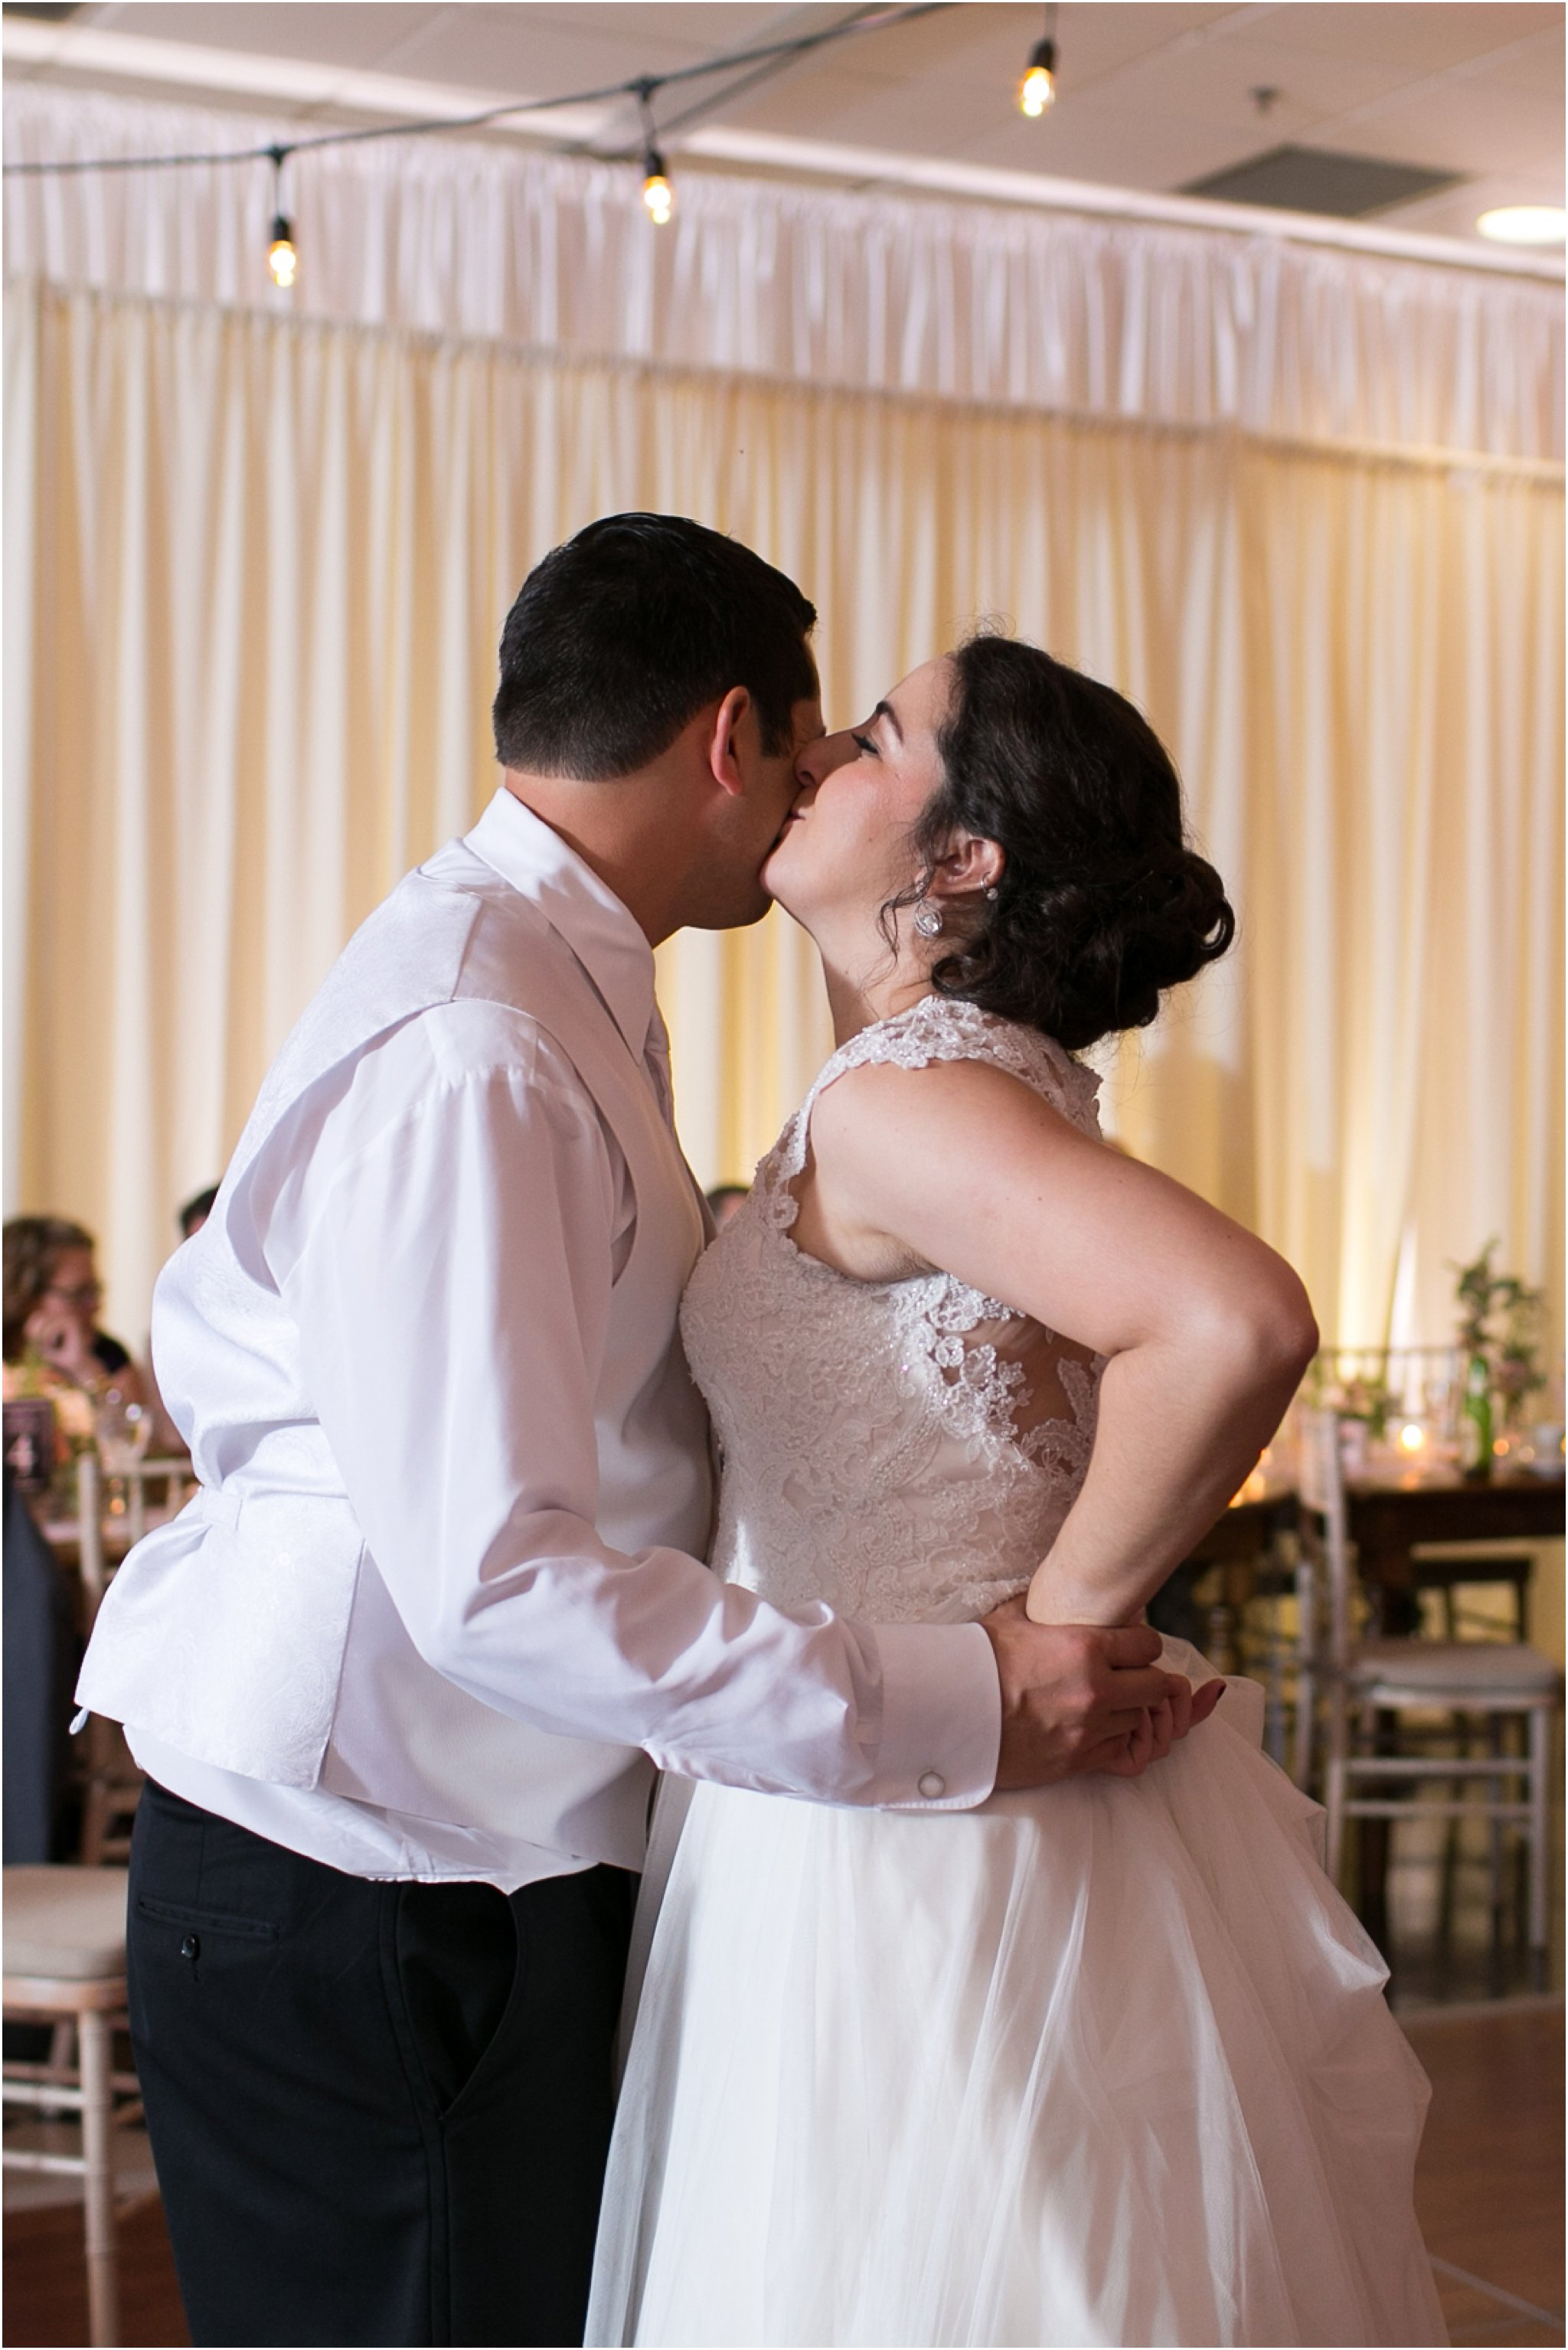 jessica_ryan_photography_virginia_wedding_photographer_wedding_hurricane_norfolk_botanical_gardens_hurricane_matthew_wedding_3650